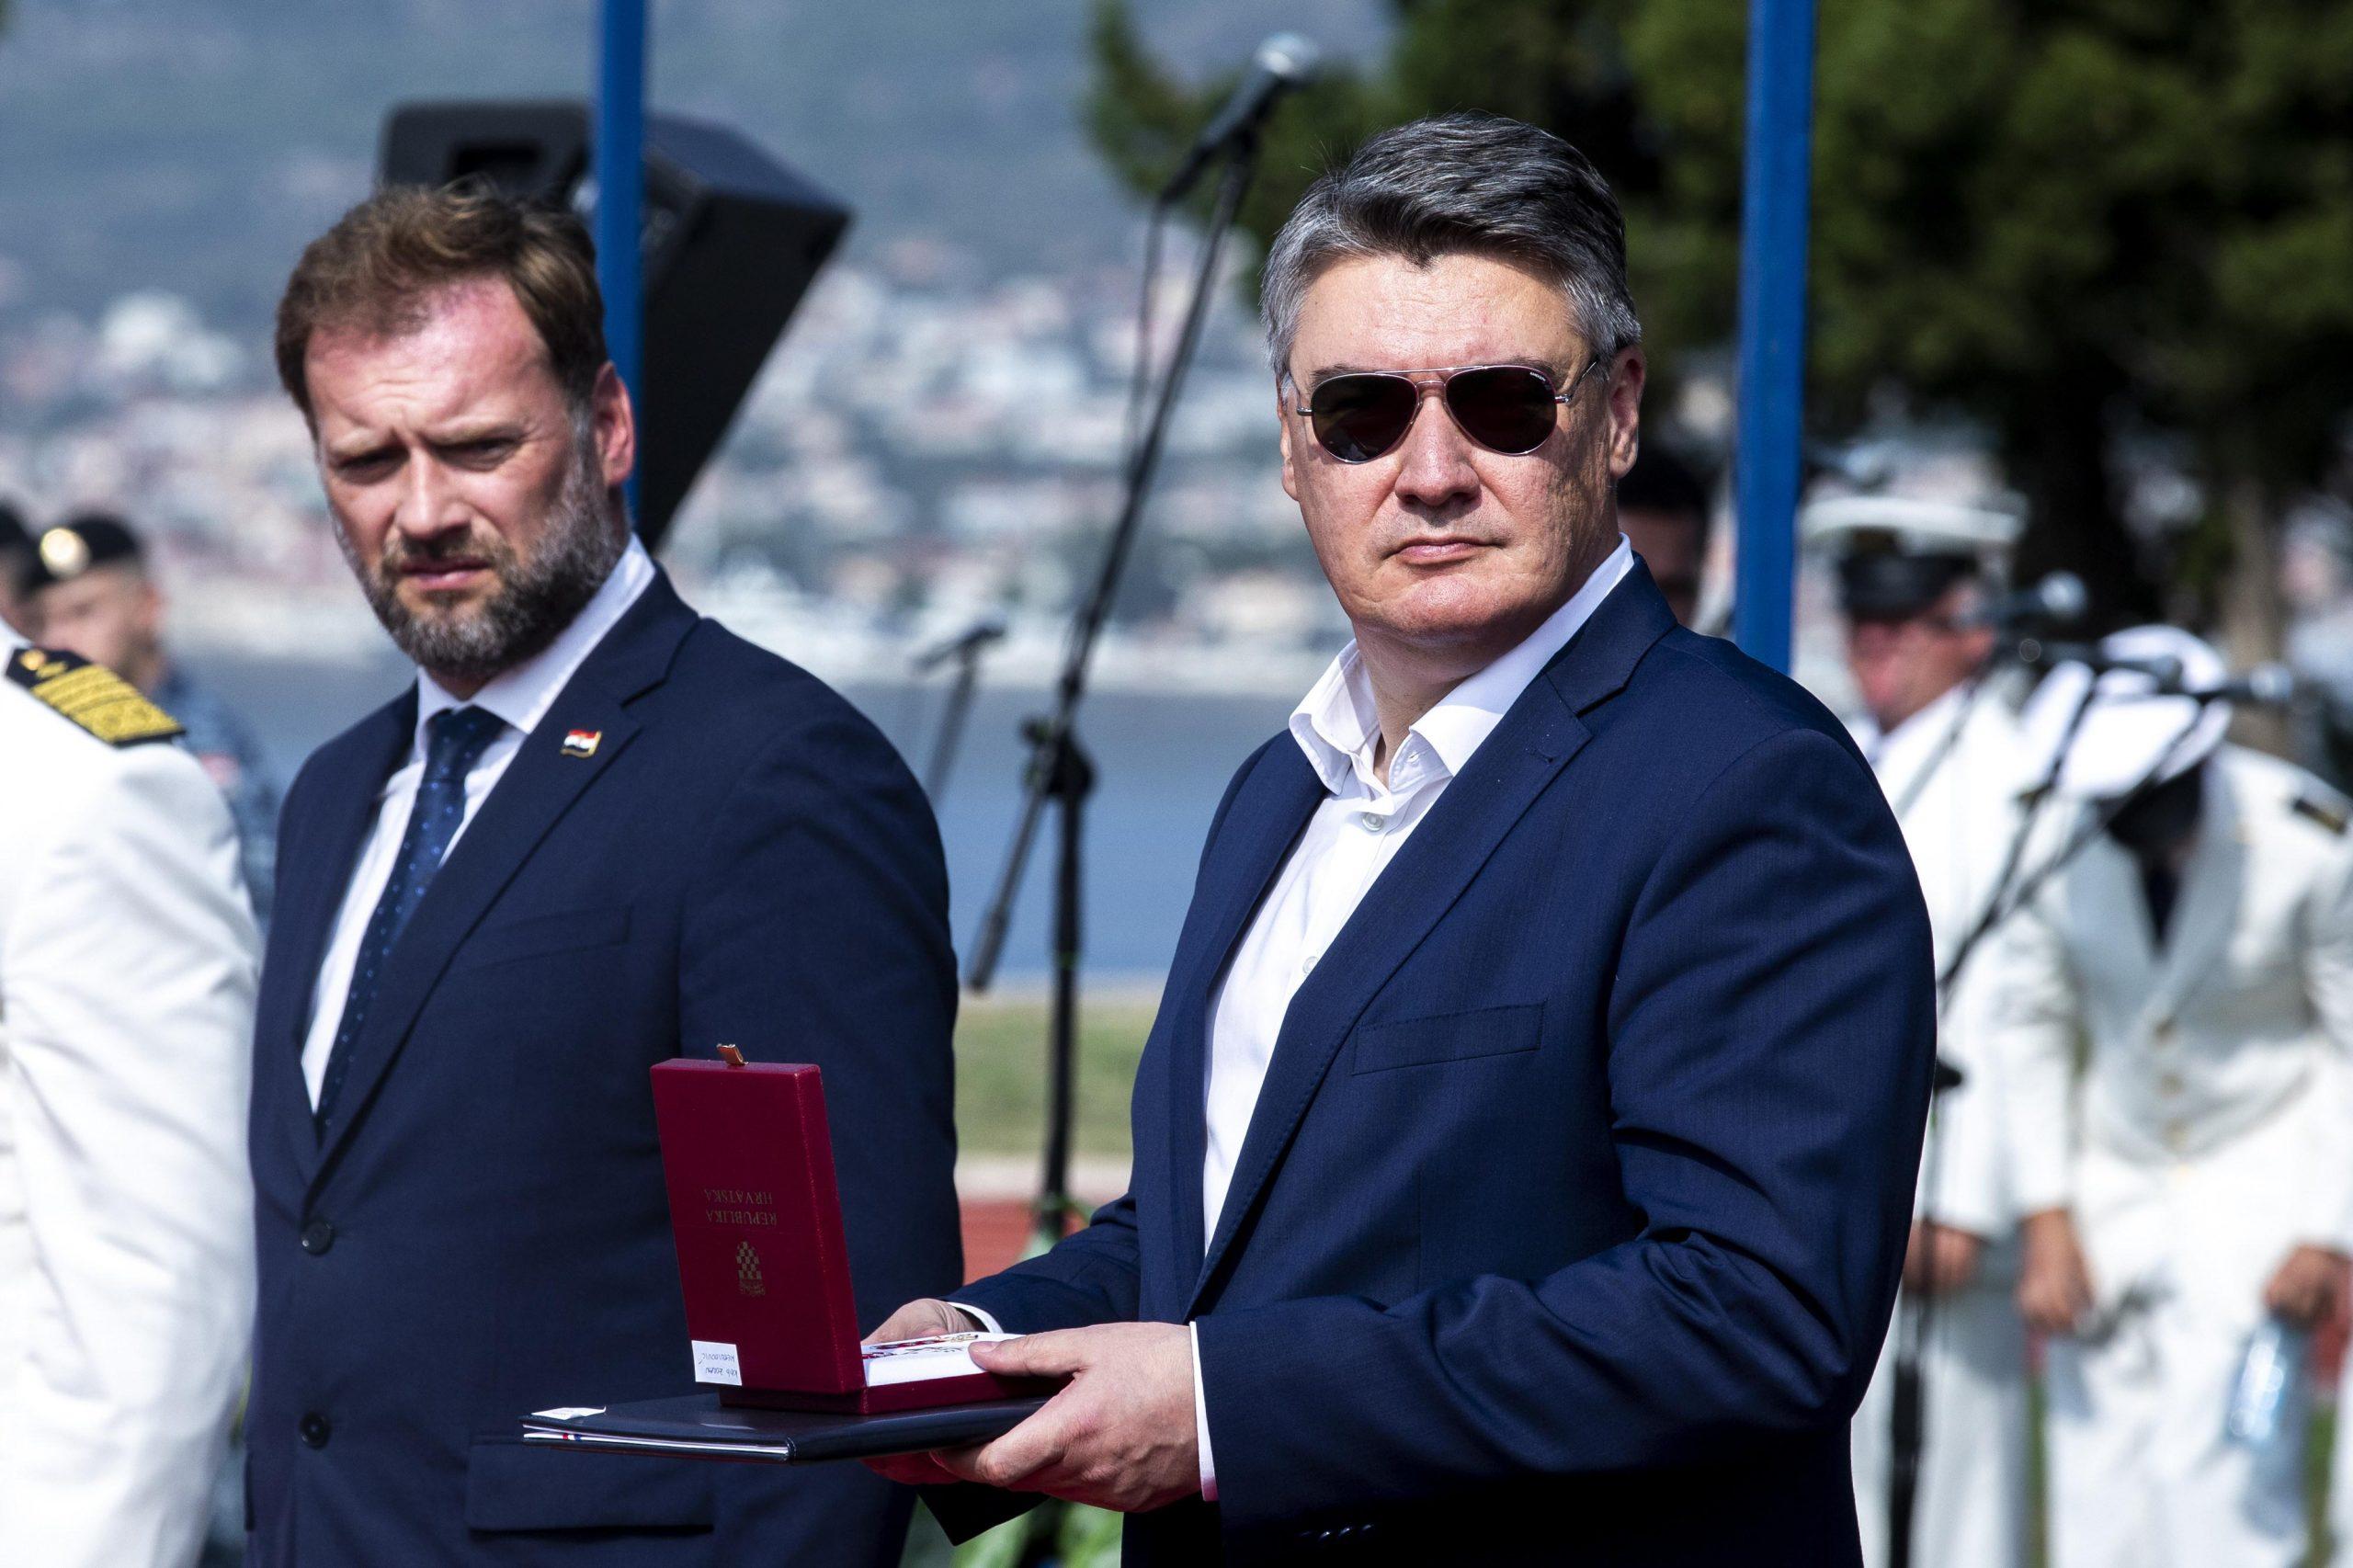 Mario Banožić i Zoran Milanović / Foto Miroslav Lelas/PIXSELL